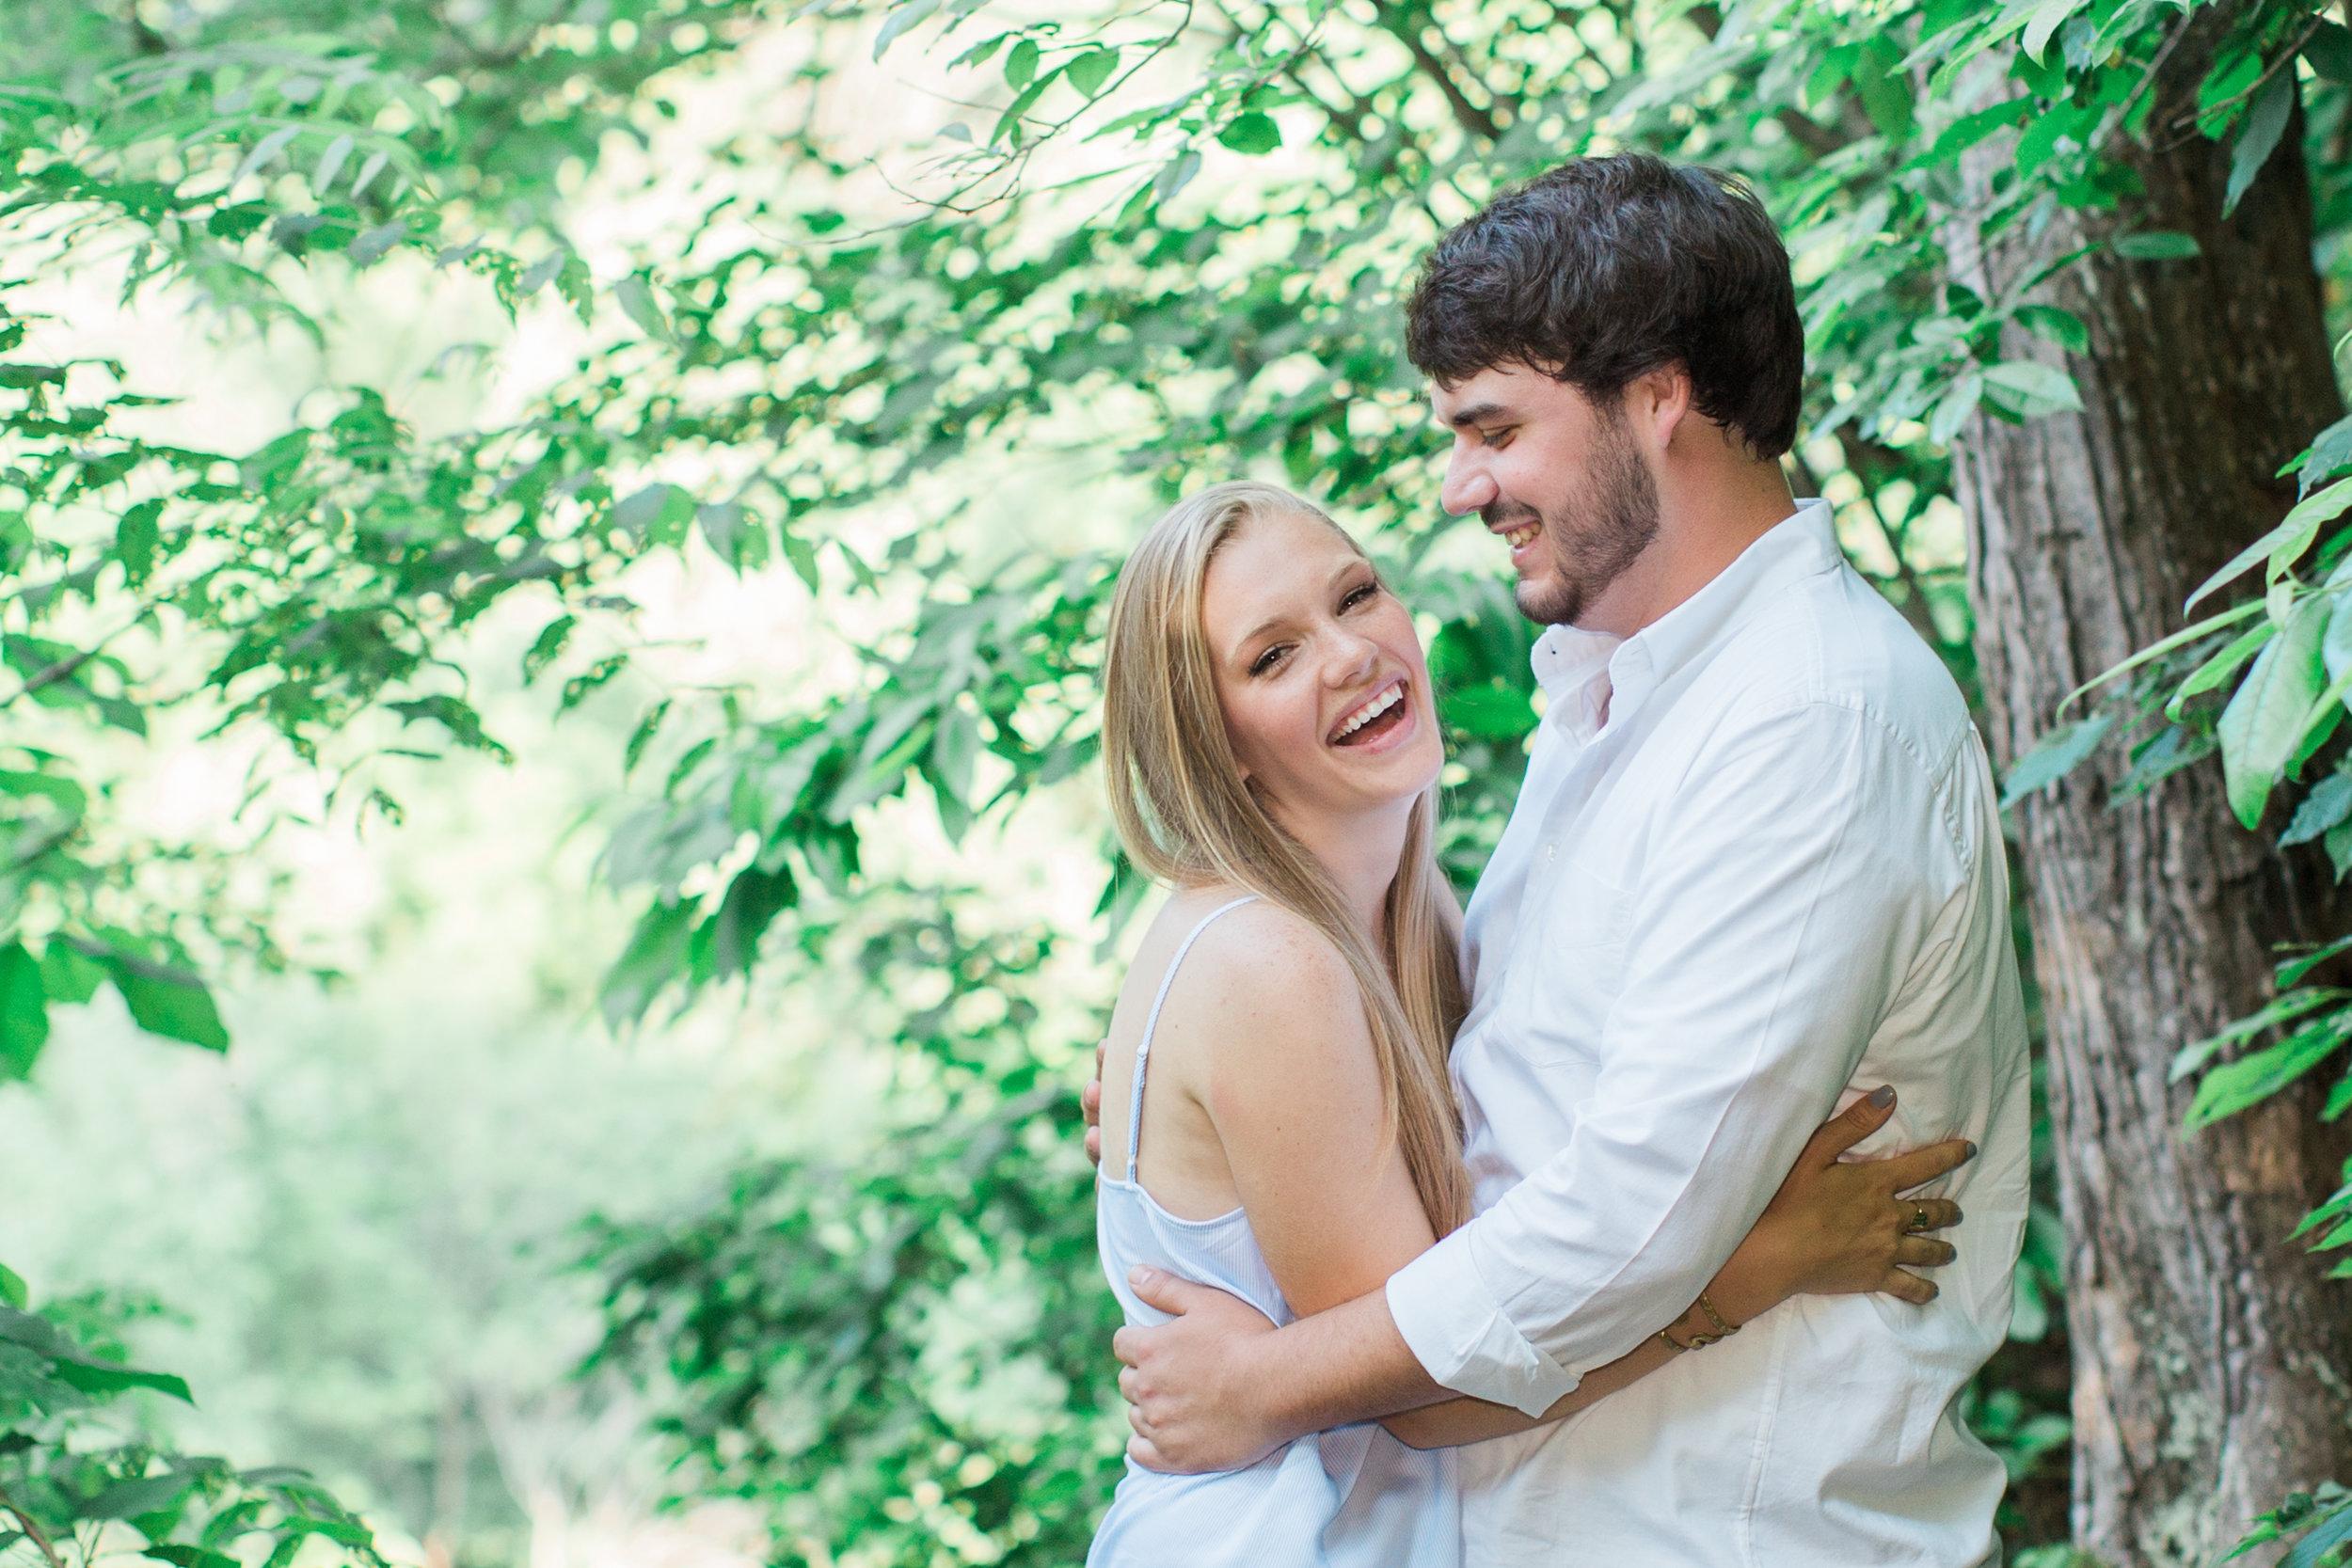 lynchburg_wedding_photographer_haley_trevor-12.jpg